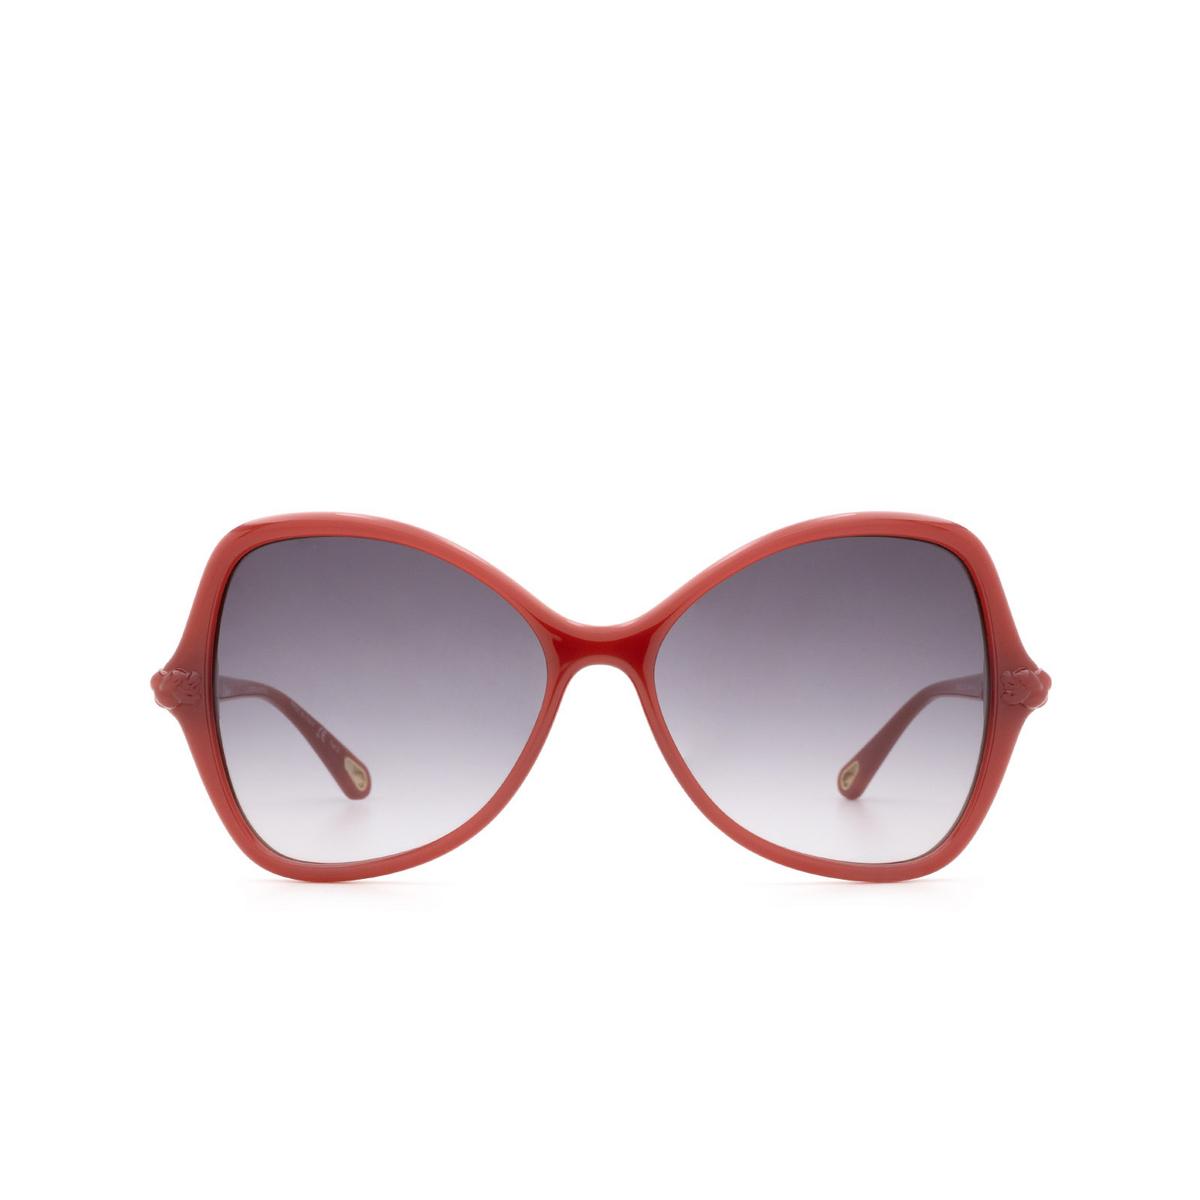 Chloé® Butterfly Sunglasses: CH0001S color Orange 004 - front view.